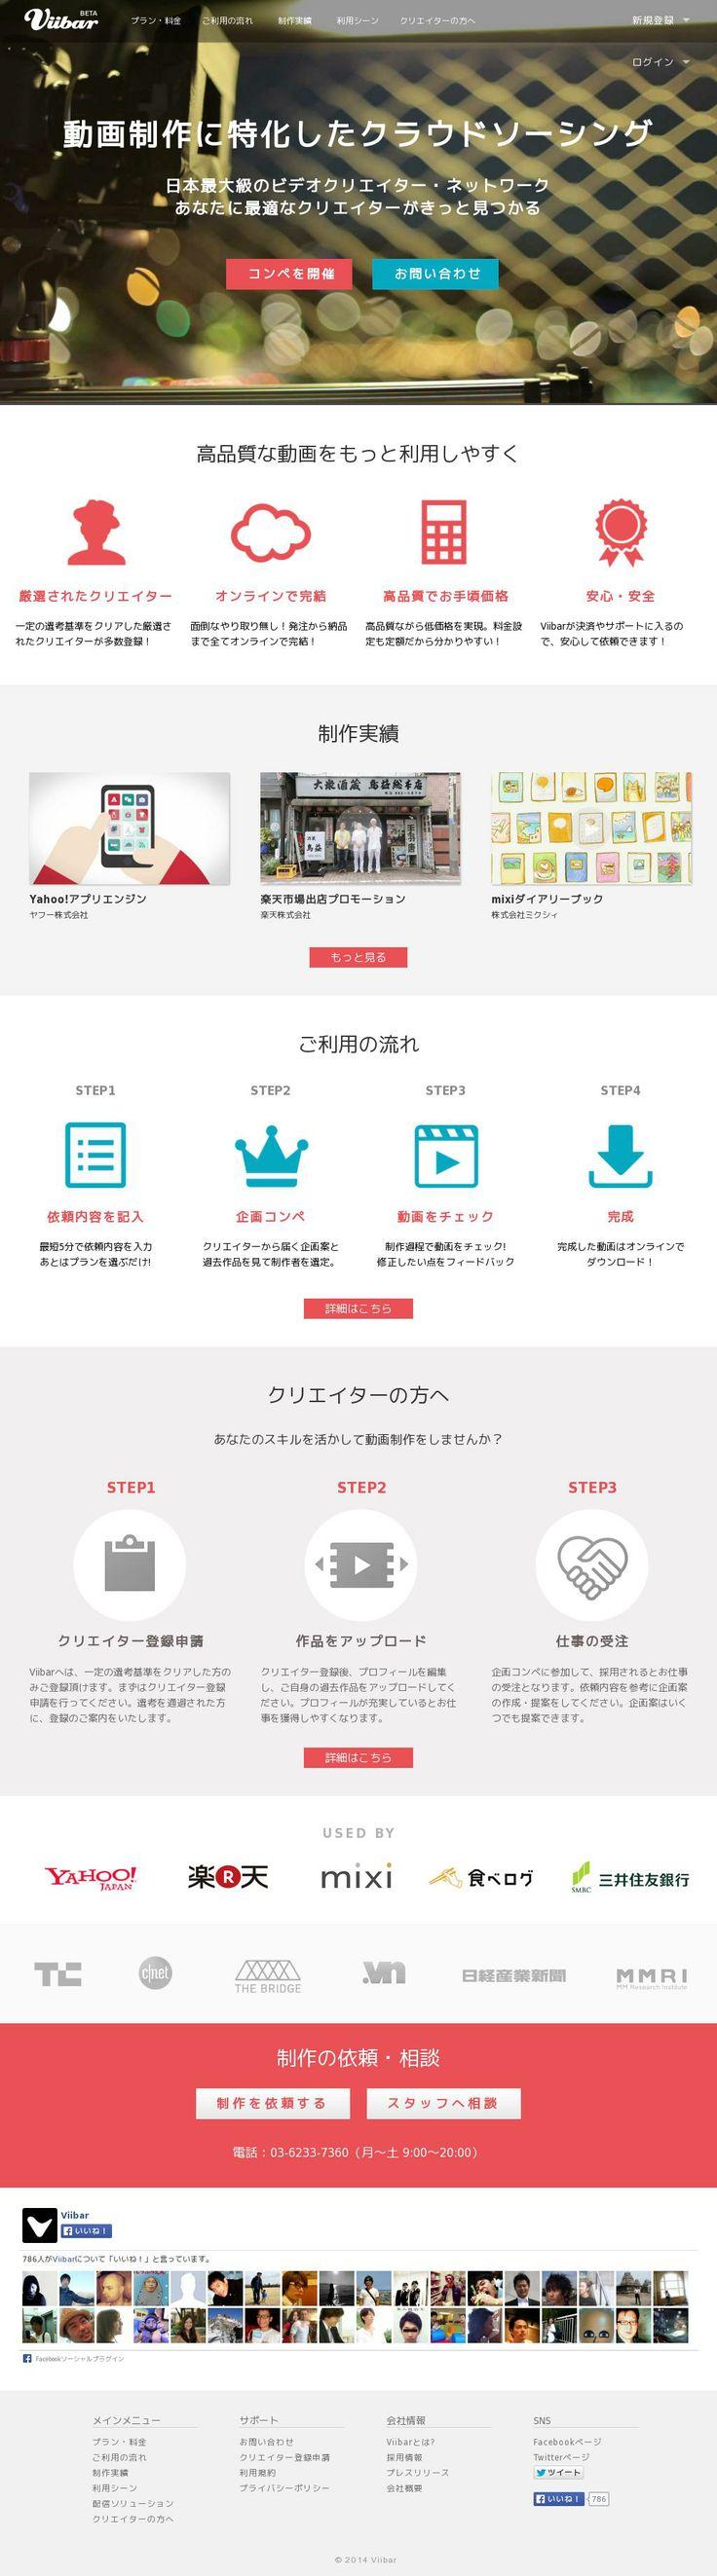 The website 'http://viibar.com/' courtesy of @Pinstamatic (http://pinstamatic.com)